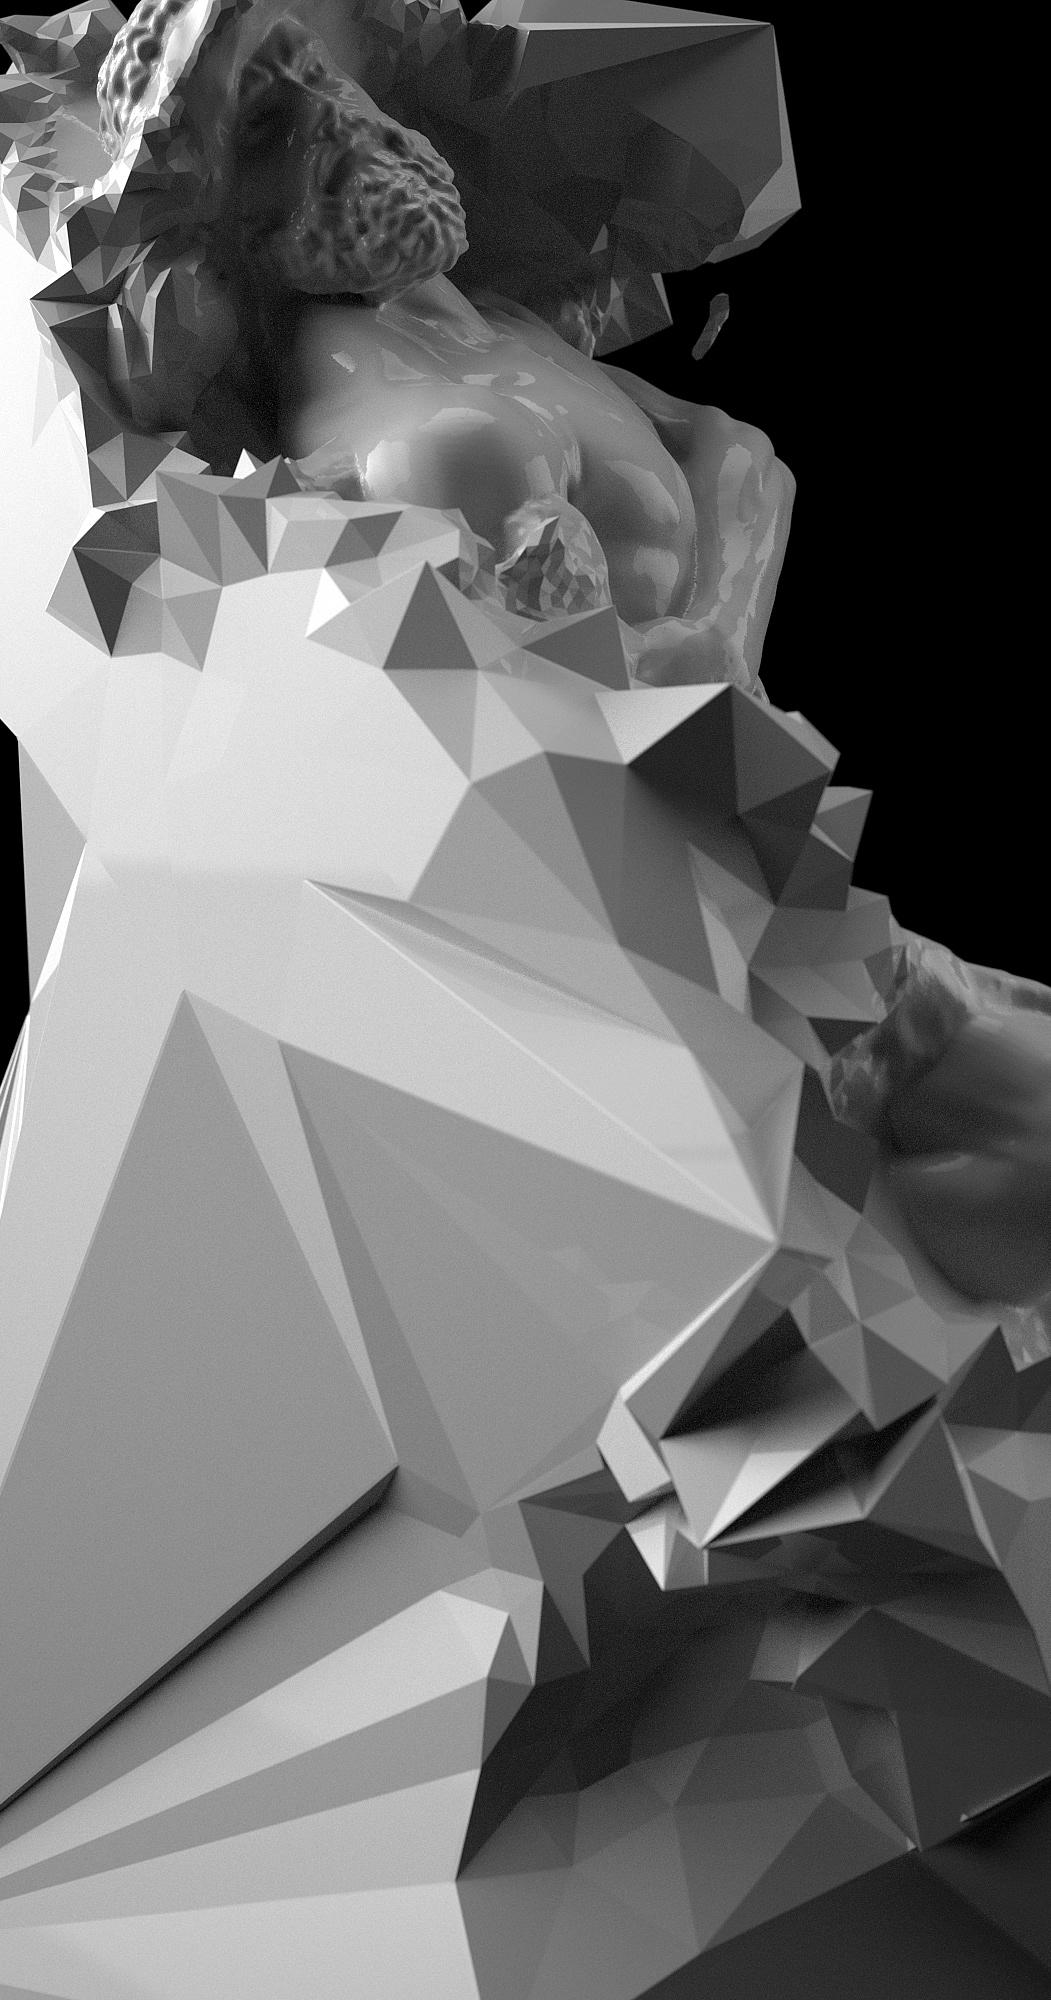 triangulation Quayola generative design pattern tesselation